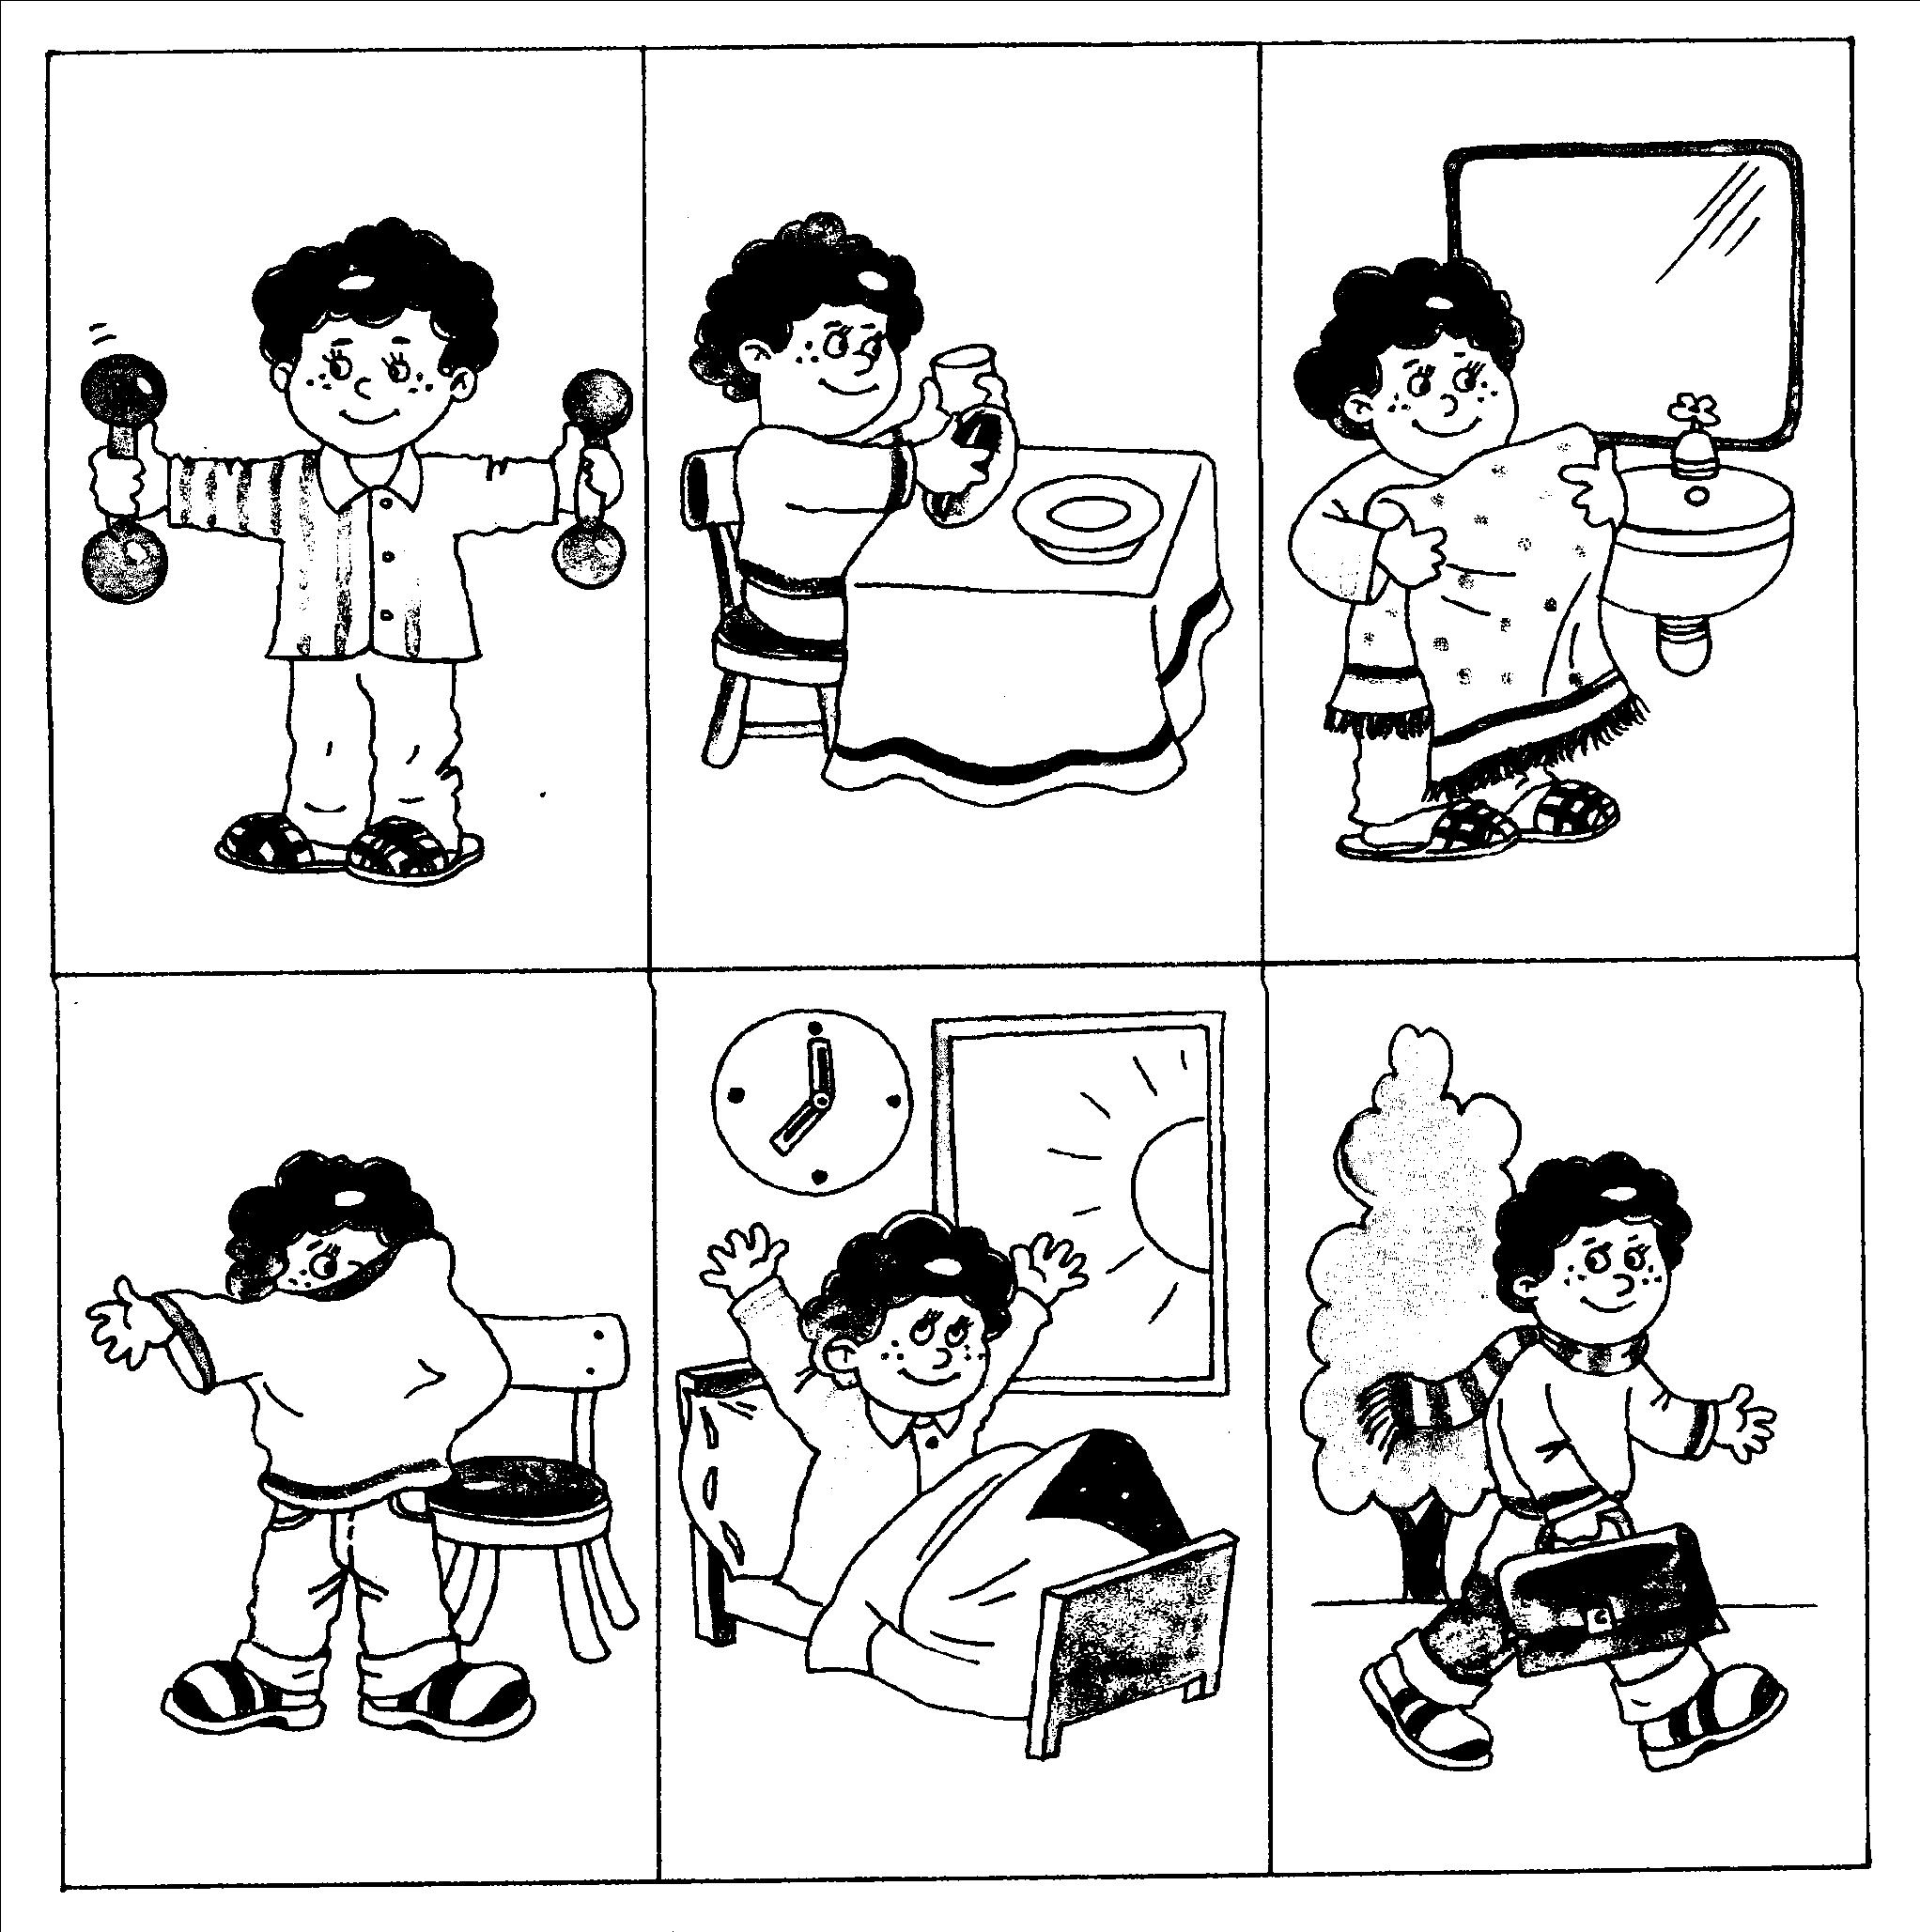 Режим дня картинки для раскраски школьника